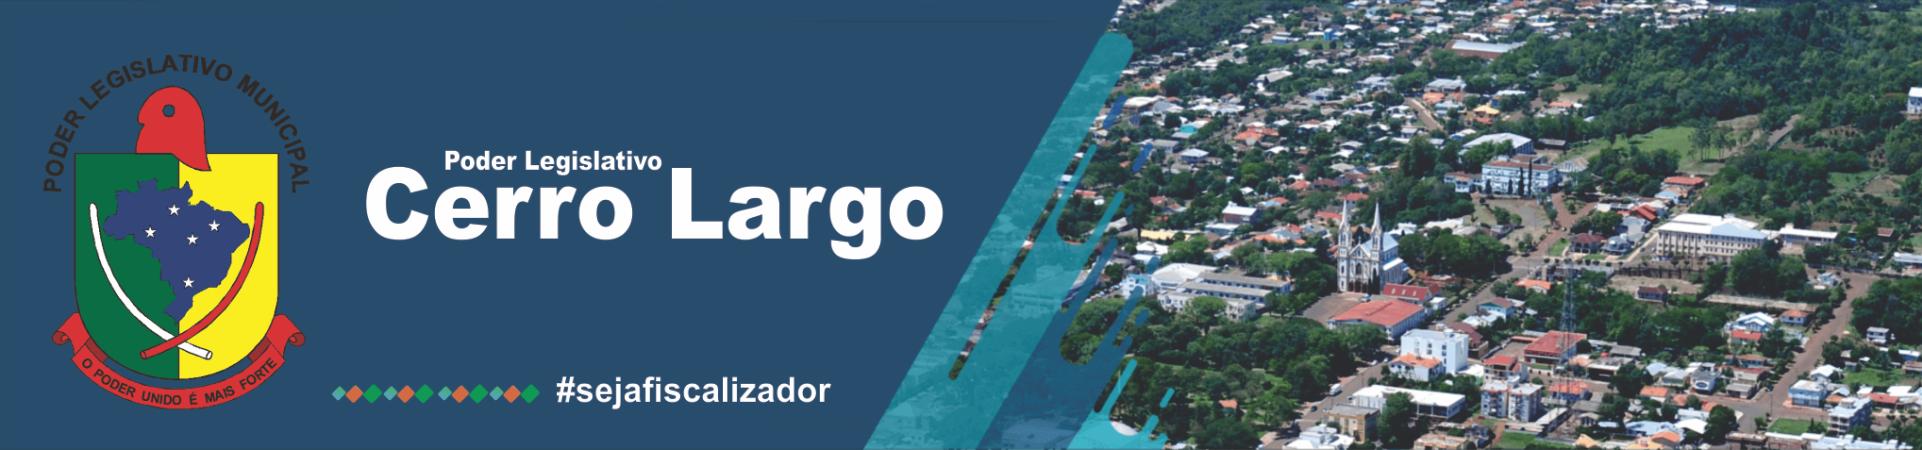 Poder Legislativo Cerro Largo - RS